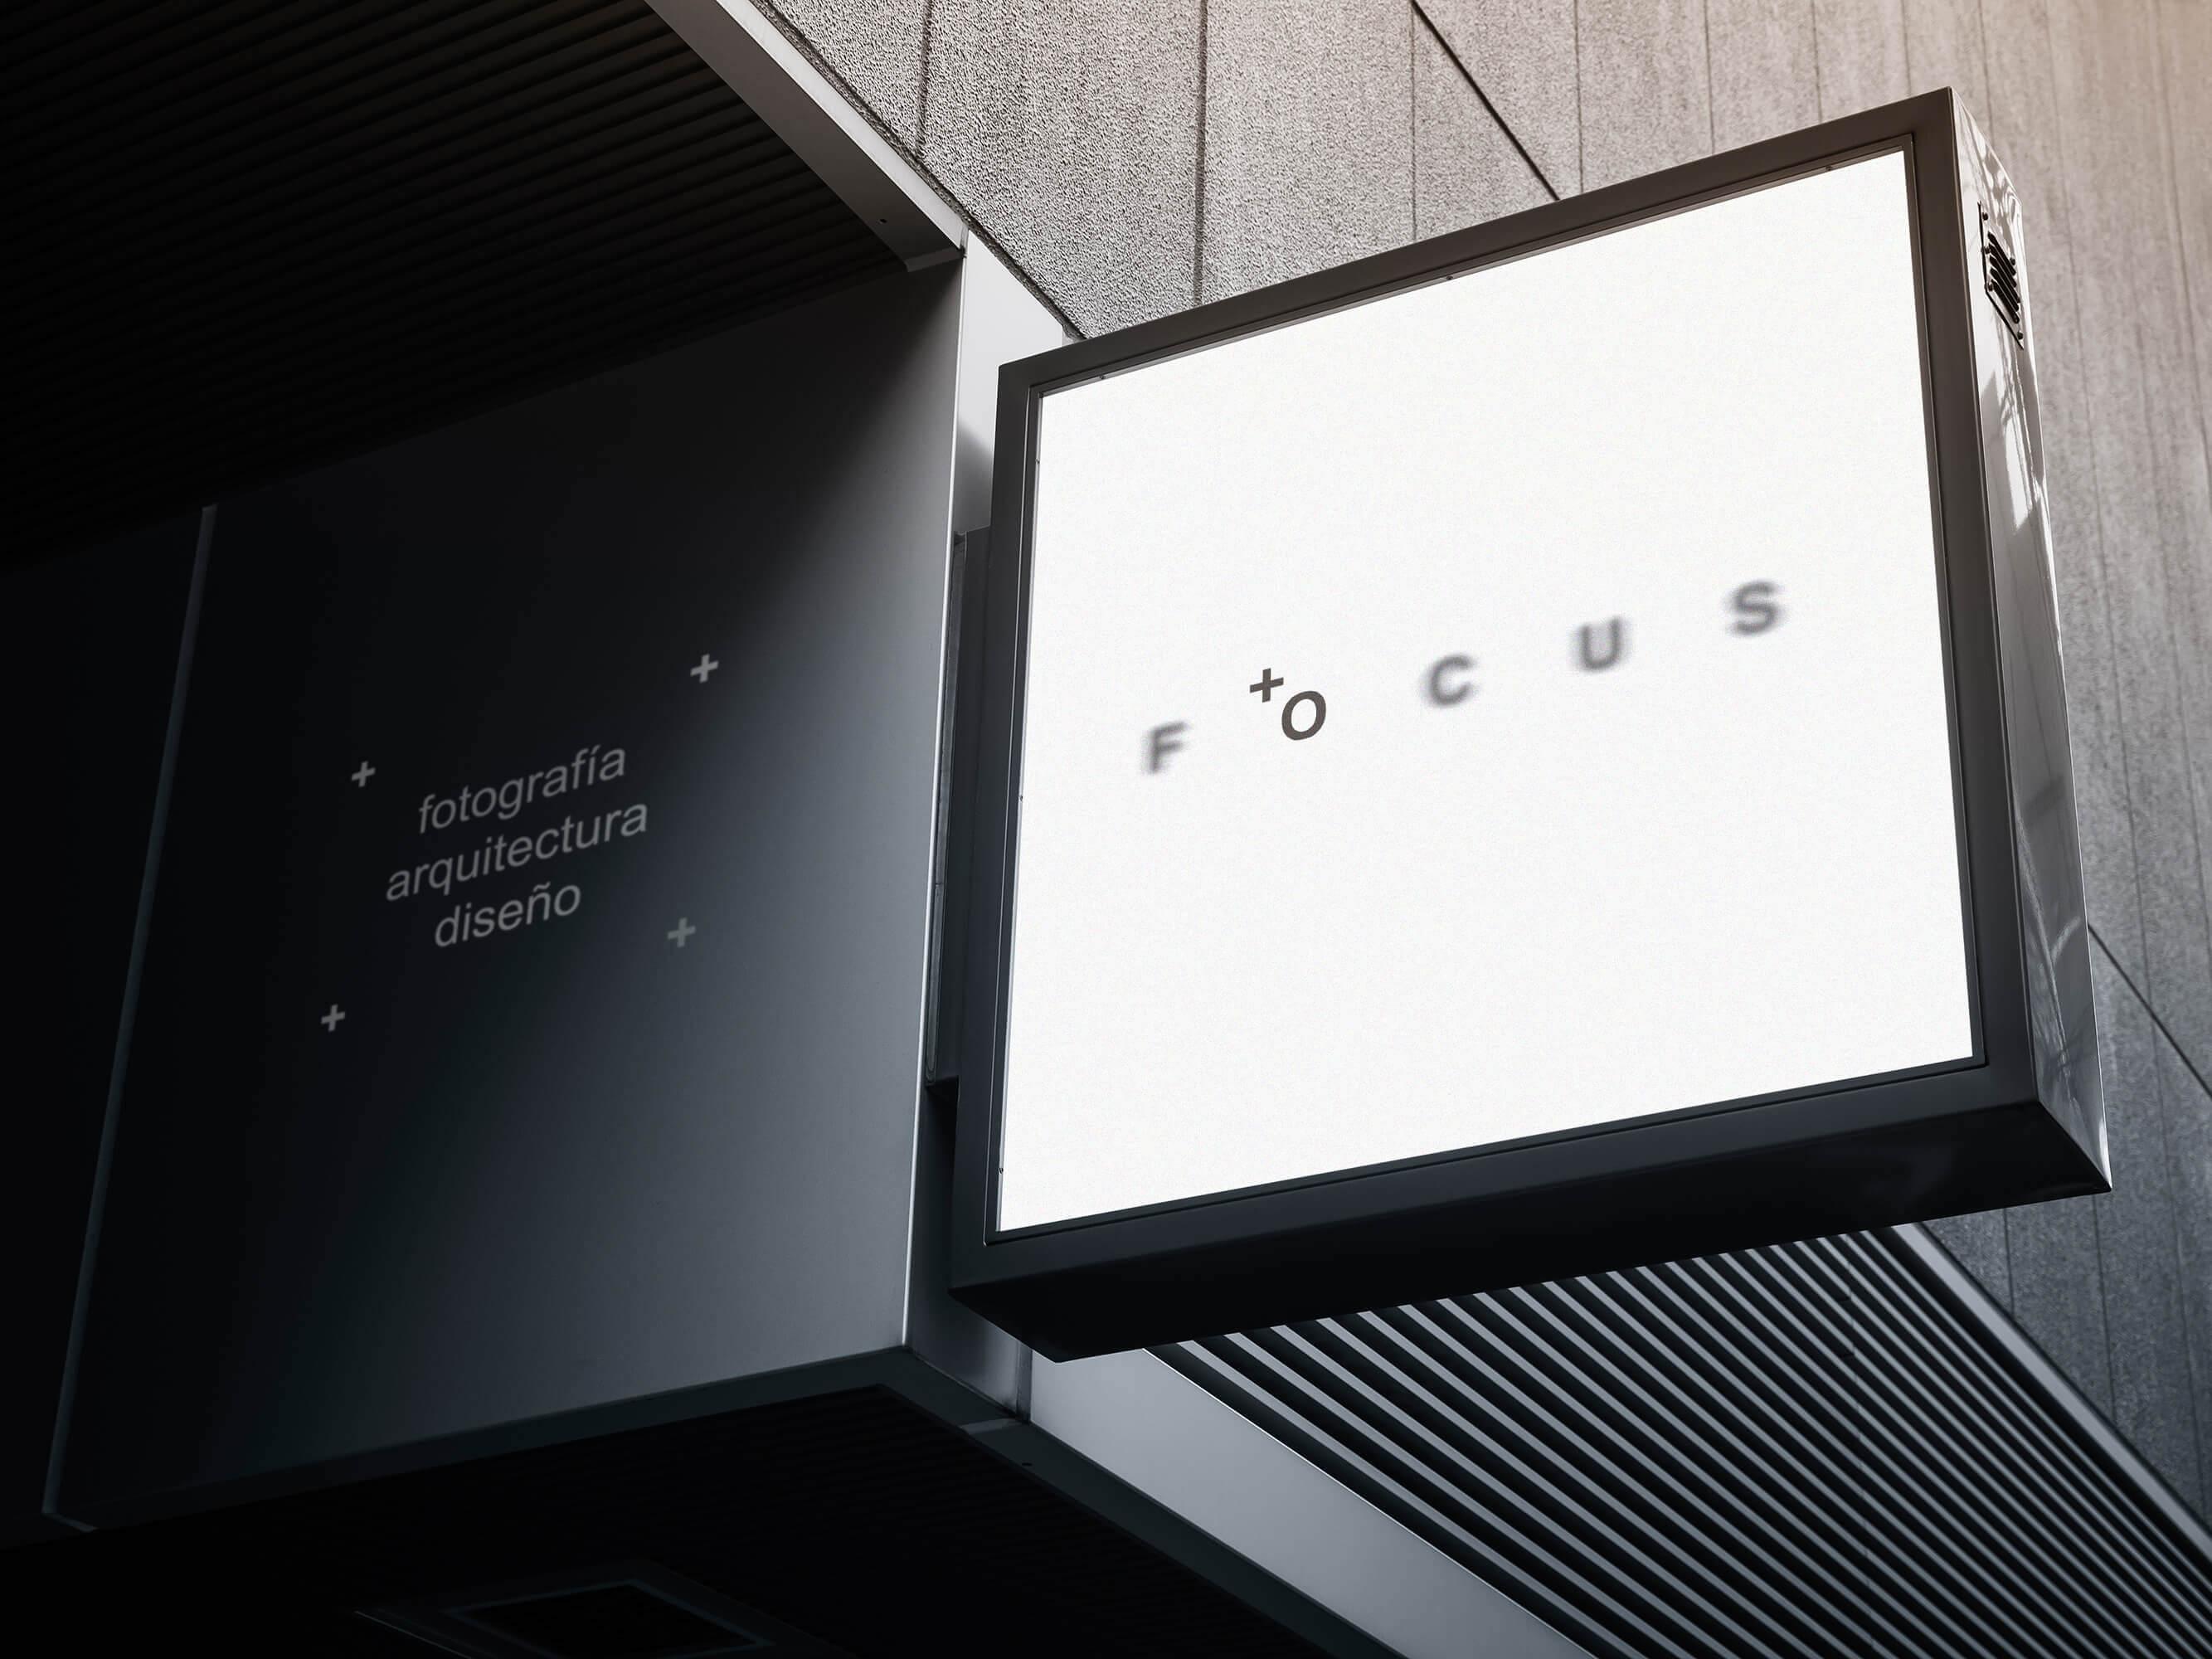 Focus Branding